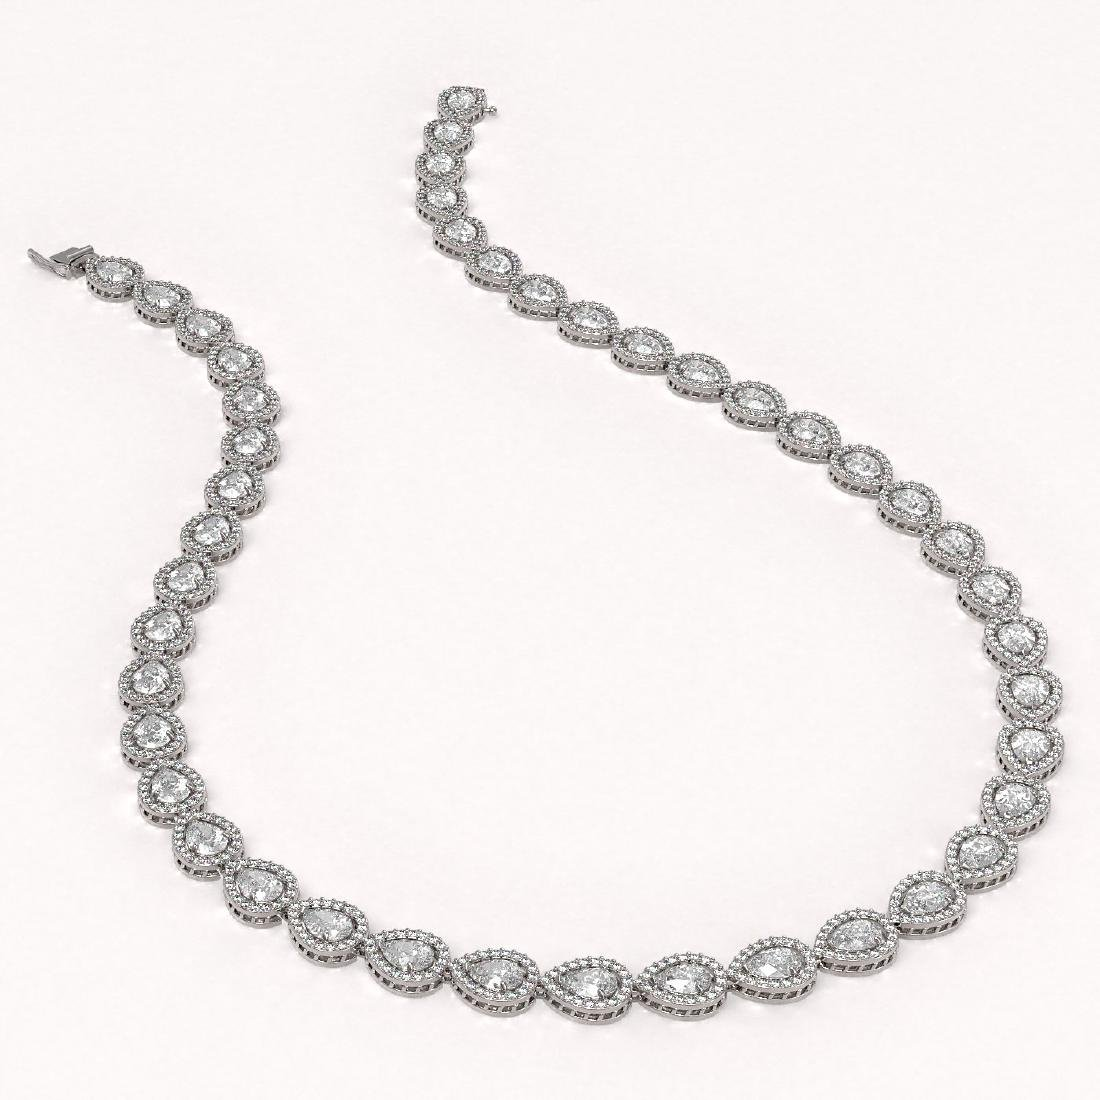 33.08 CTW Pear Diamond Designer Necklace 18K White Gold - 2